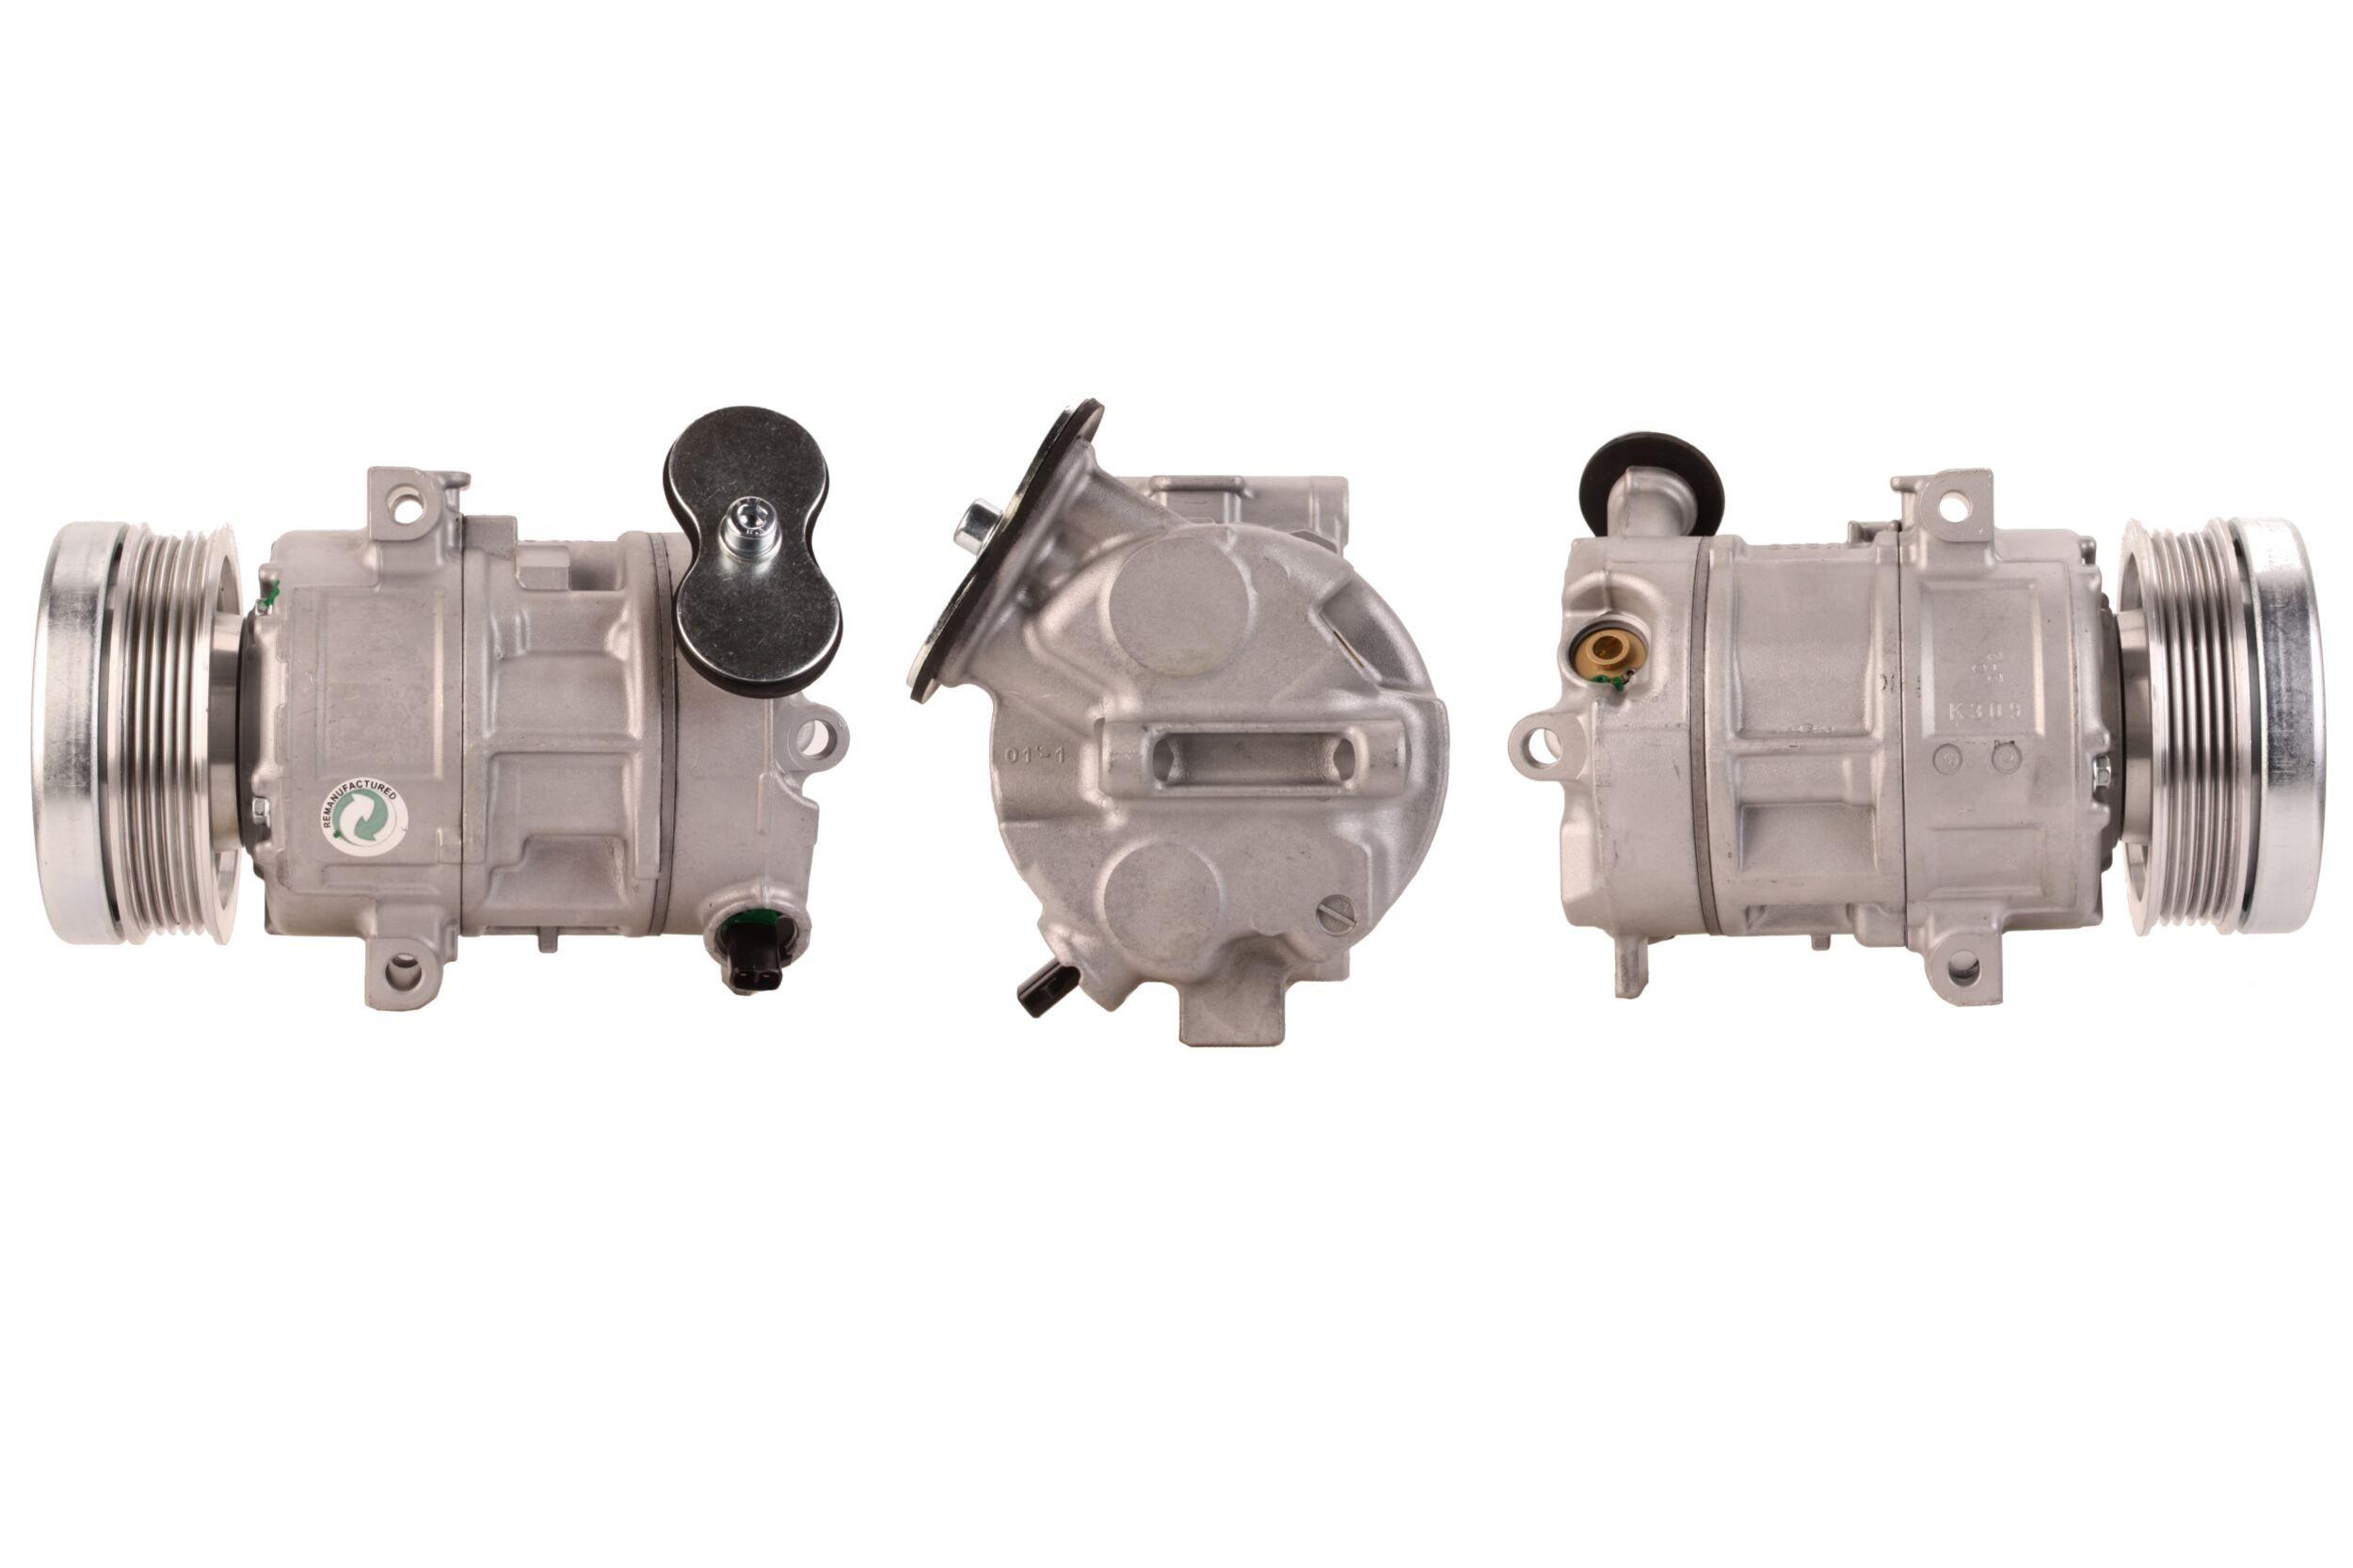 ELSTOCK Kompressori, ilmastointilaite 51-0414